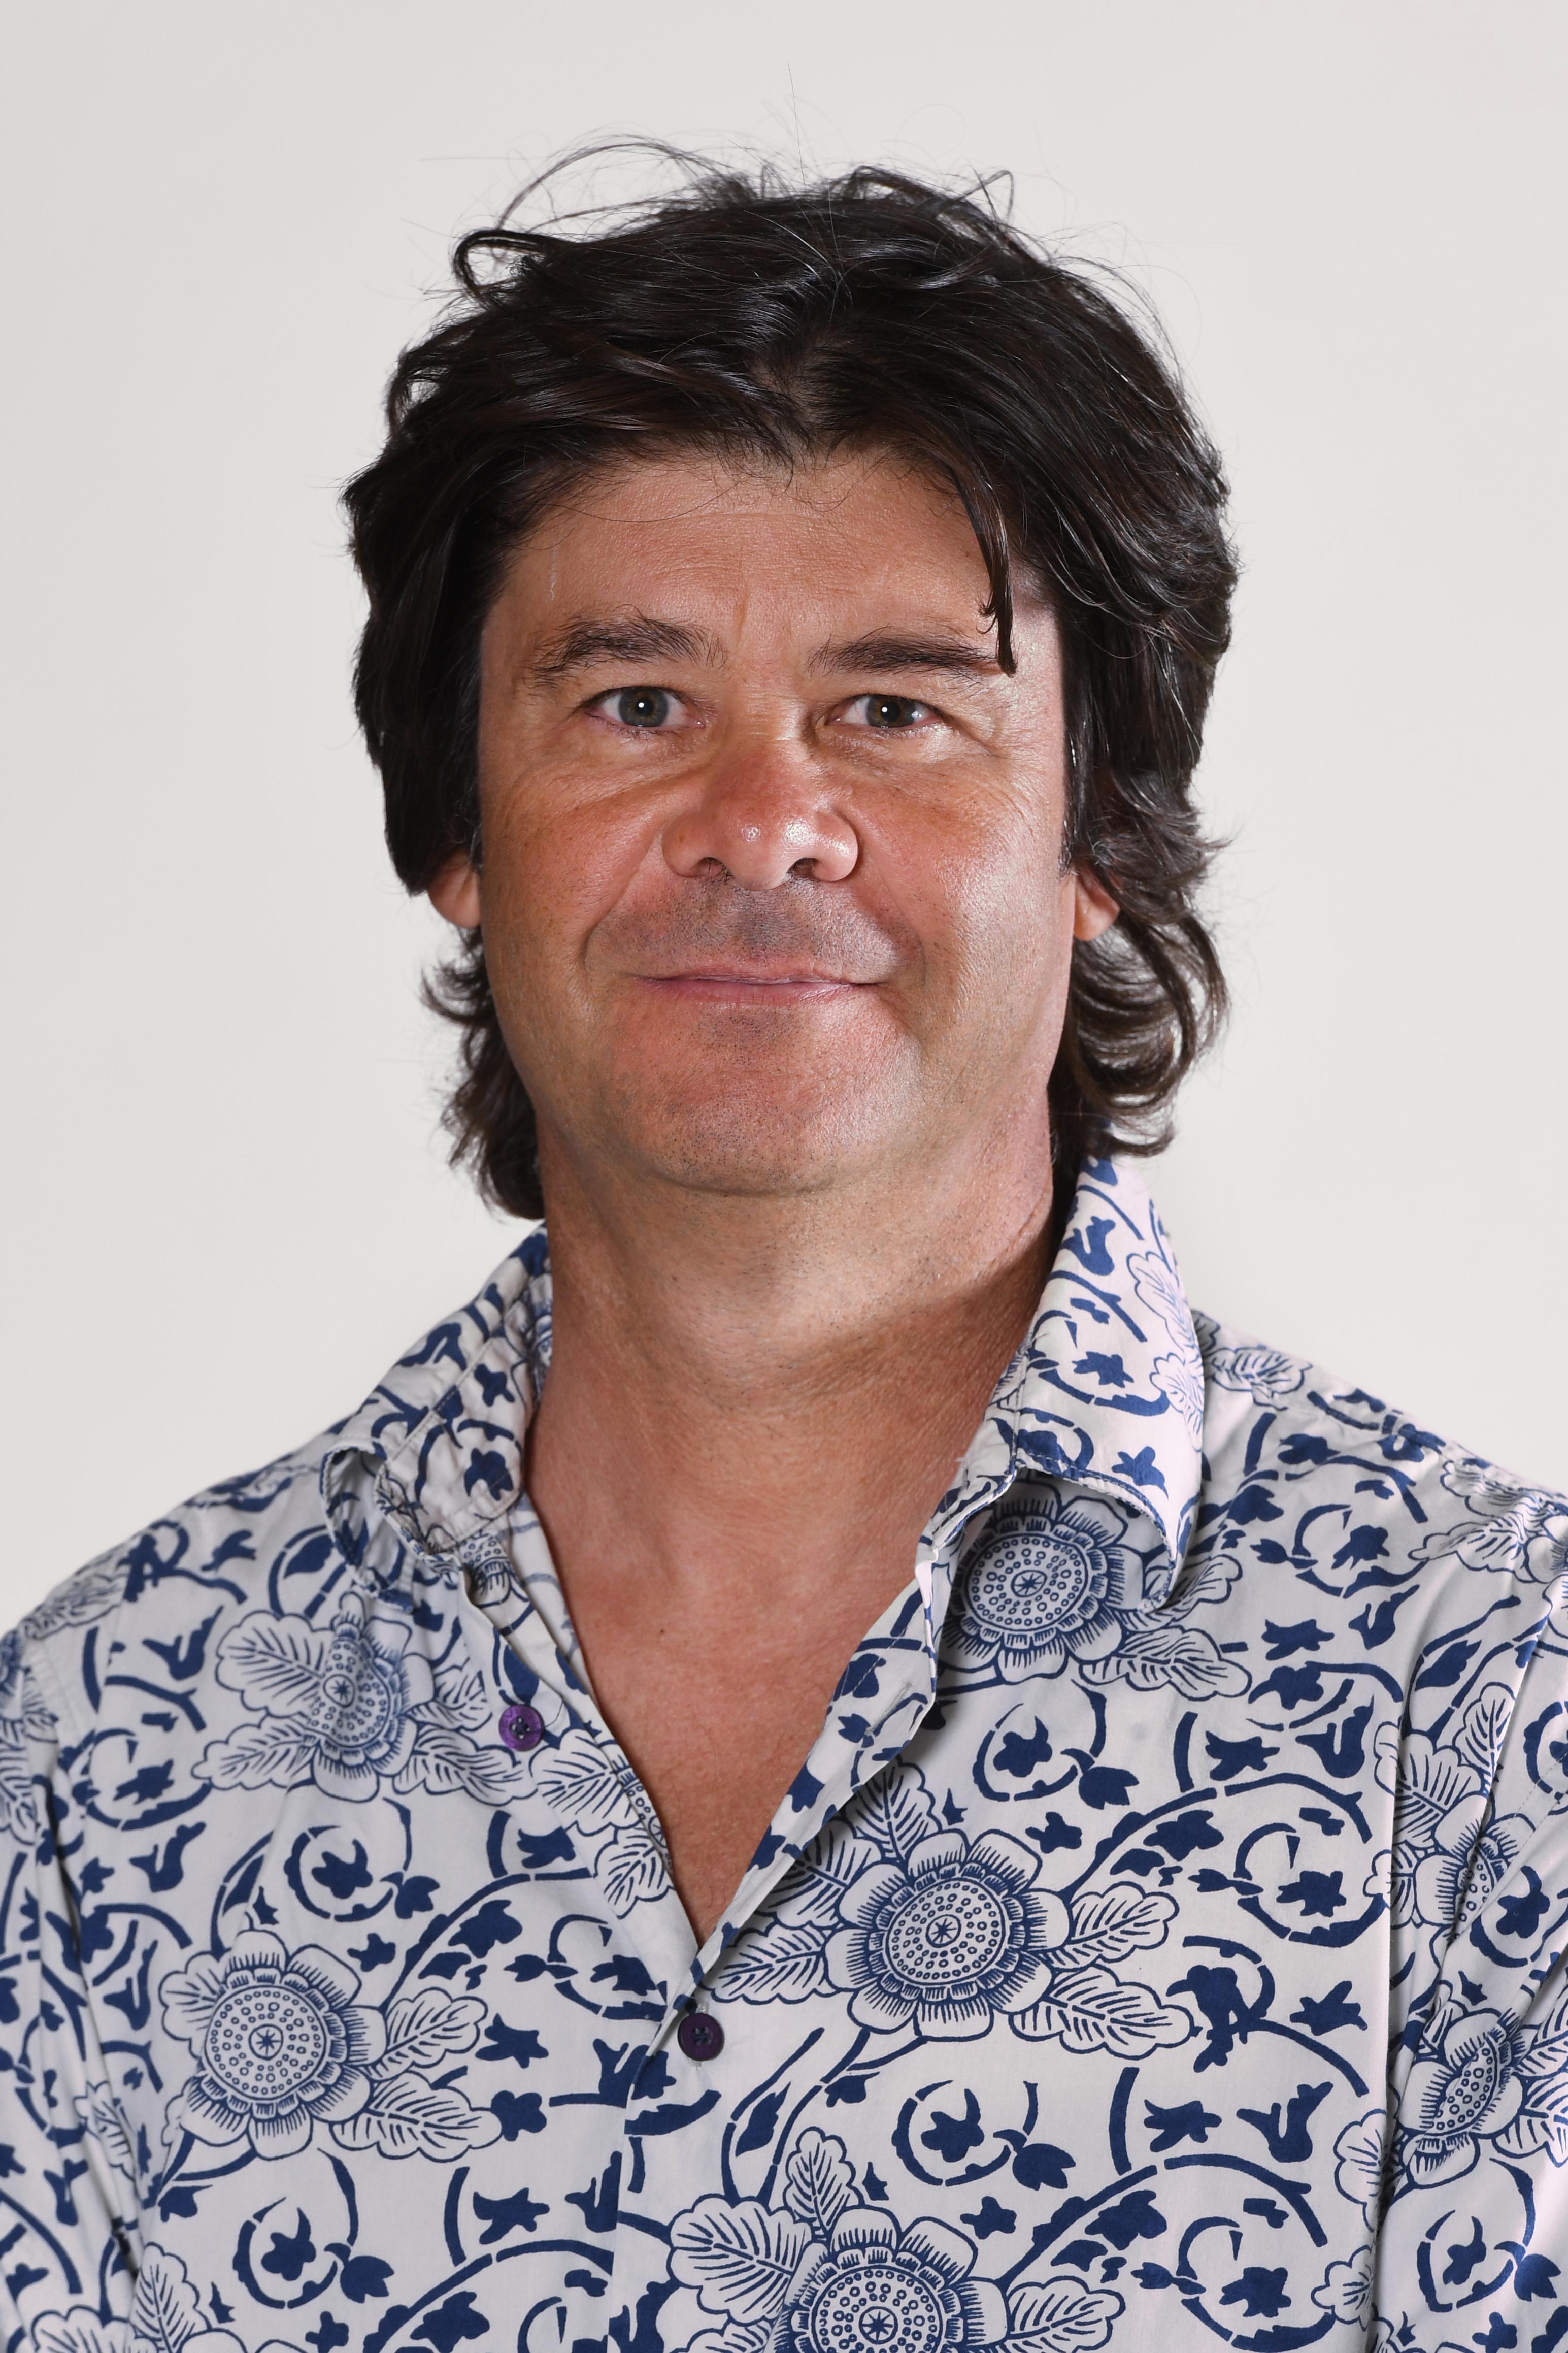 Fabrice Desmarais